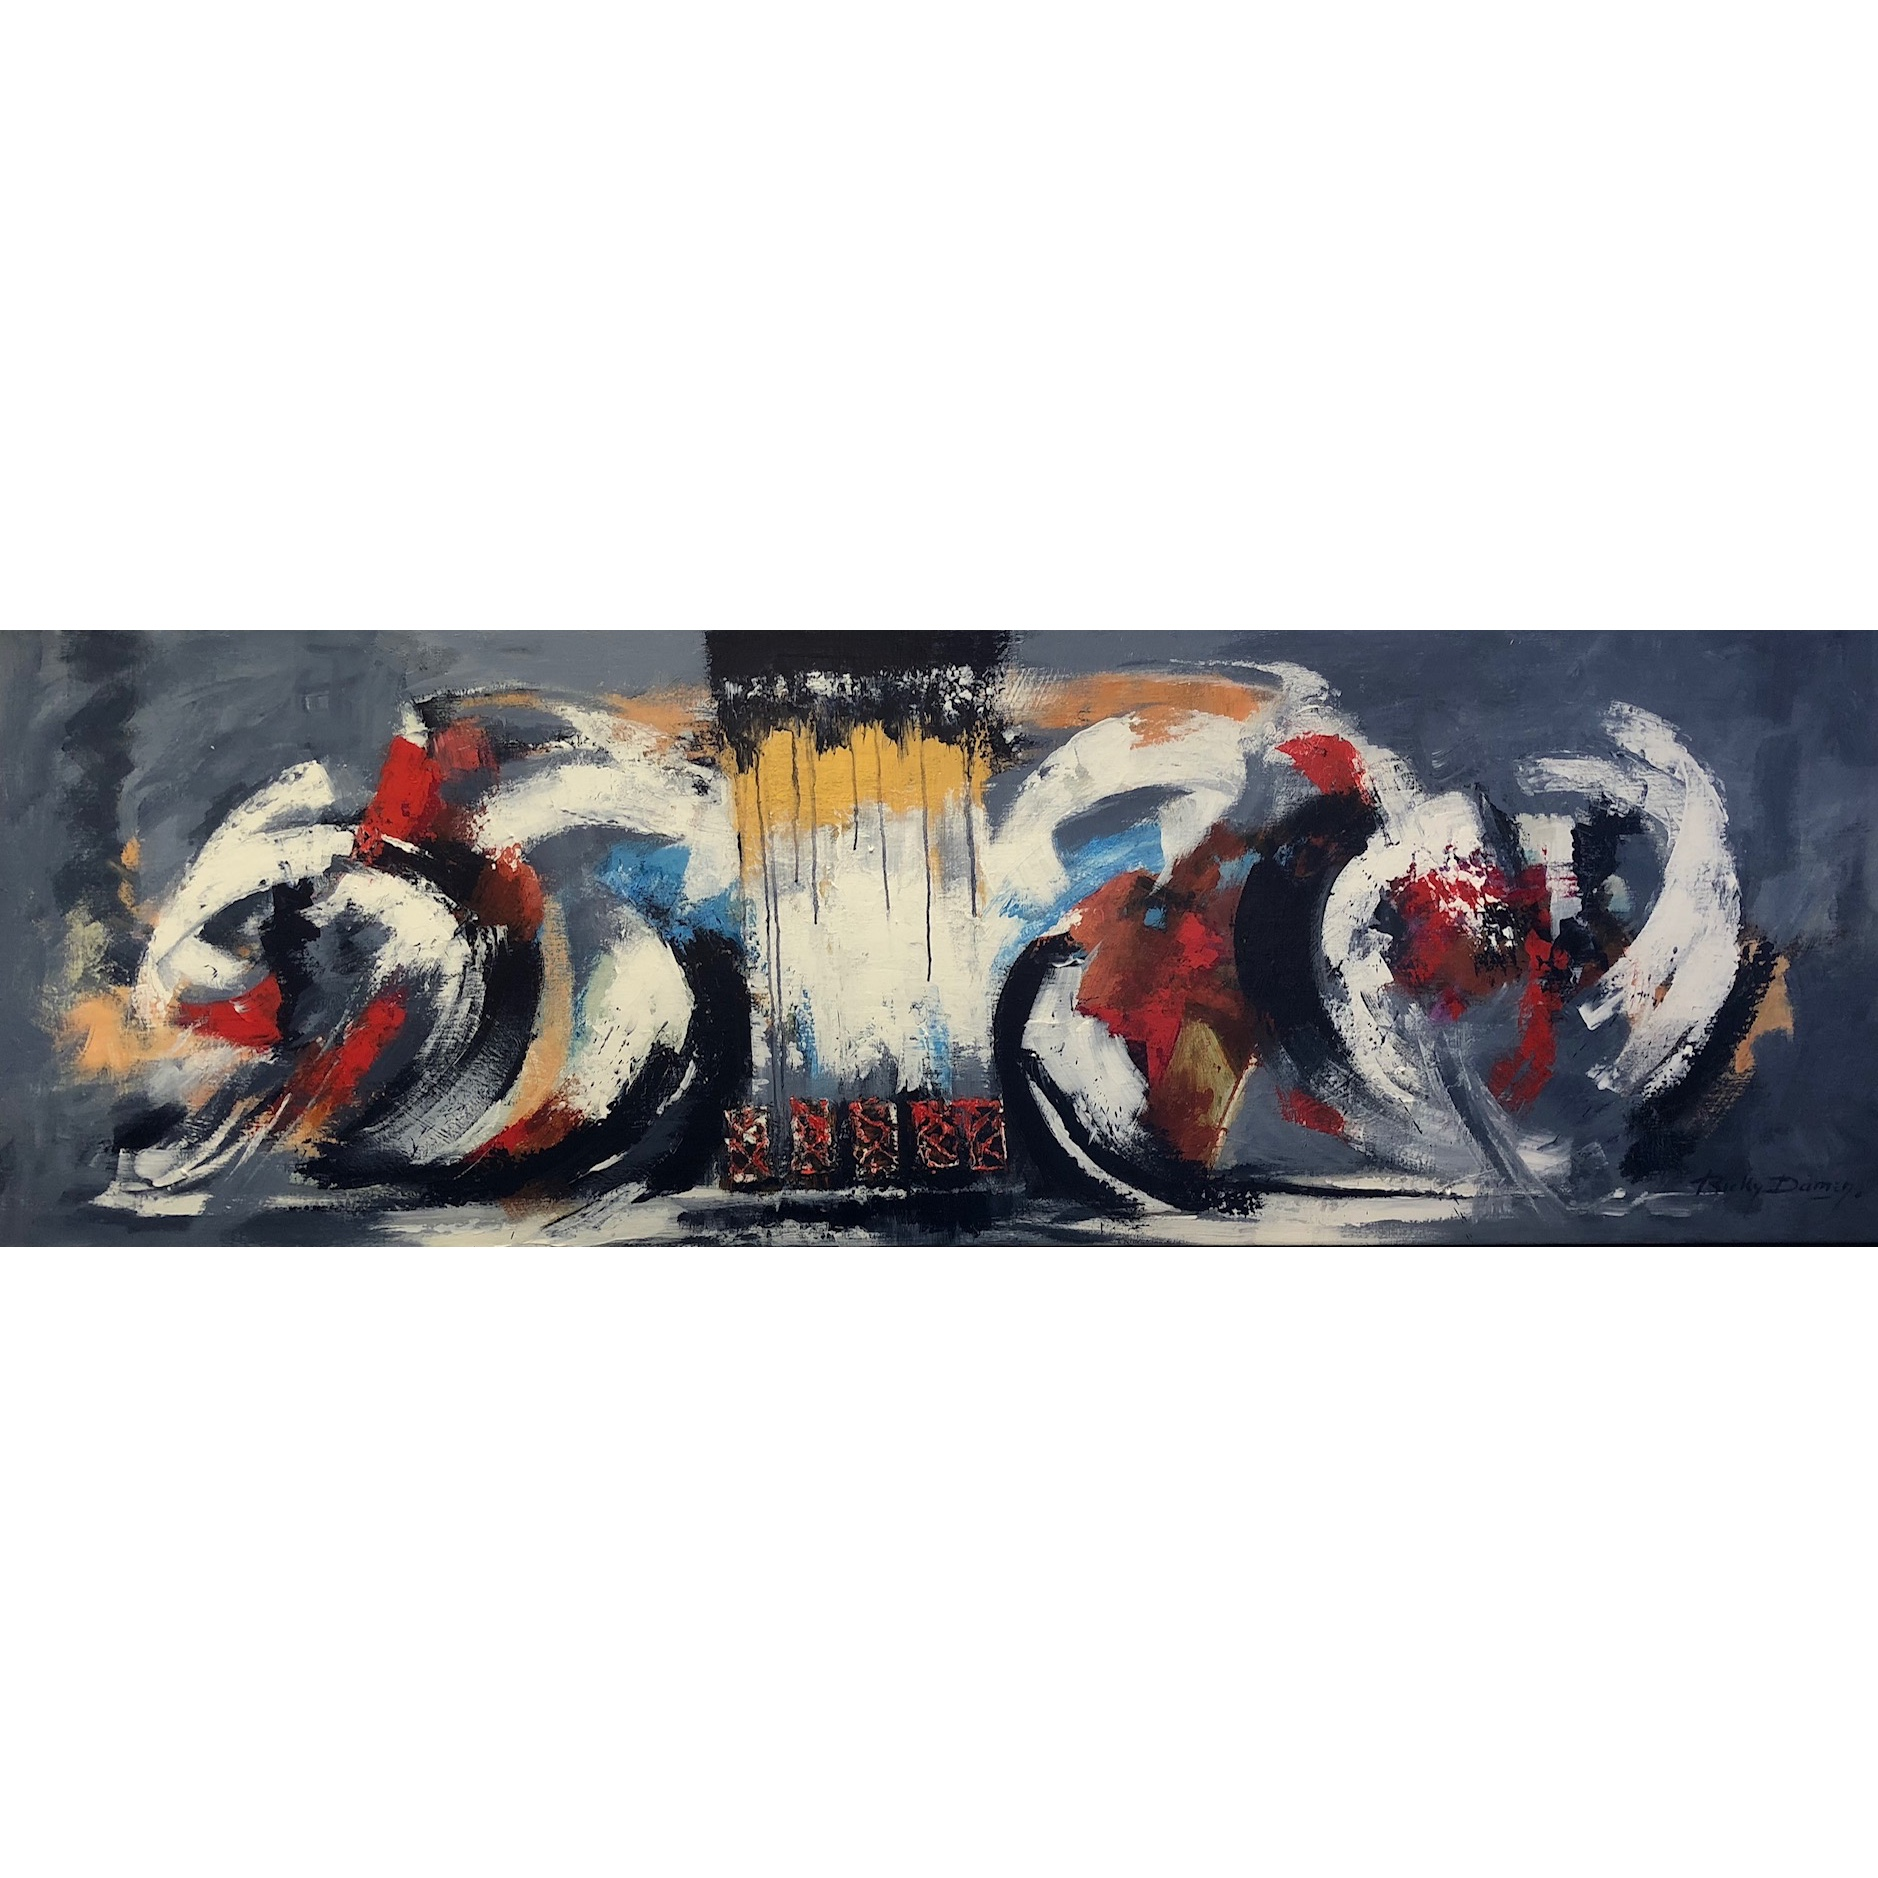 Ricky Damen schilderij 'Powerful'